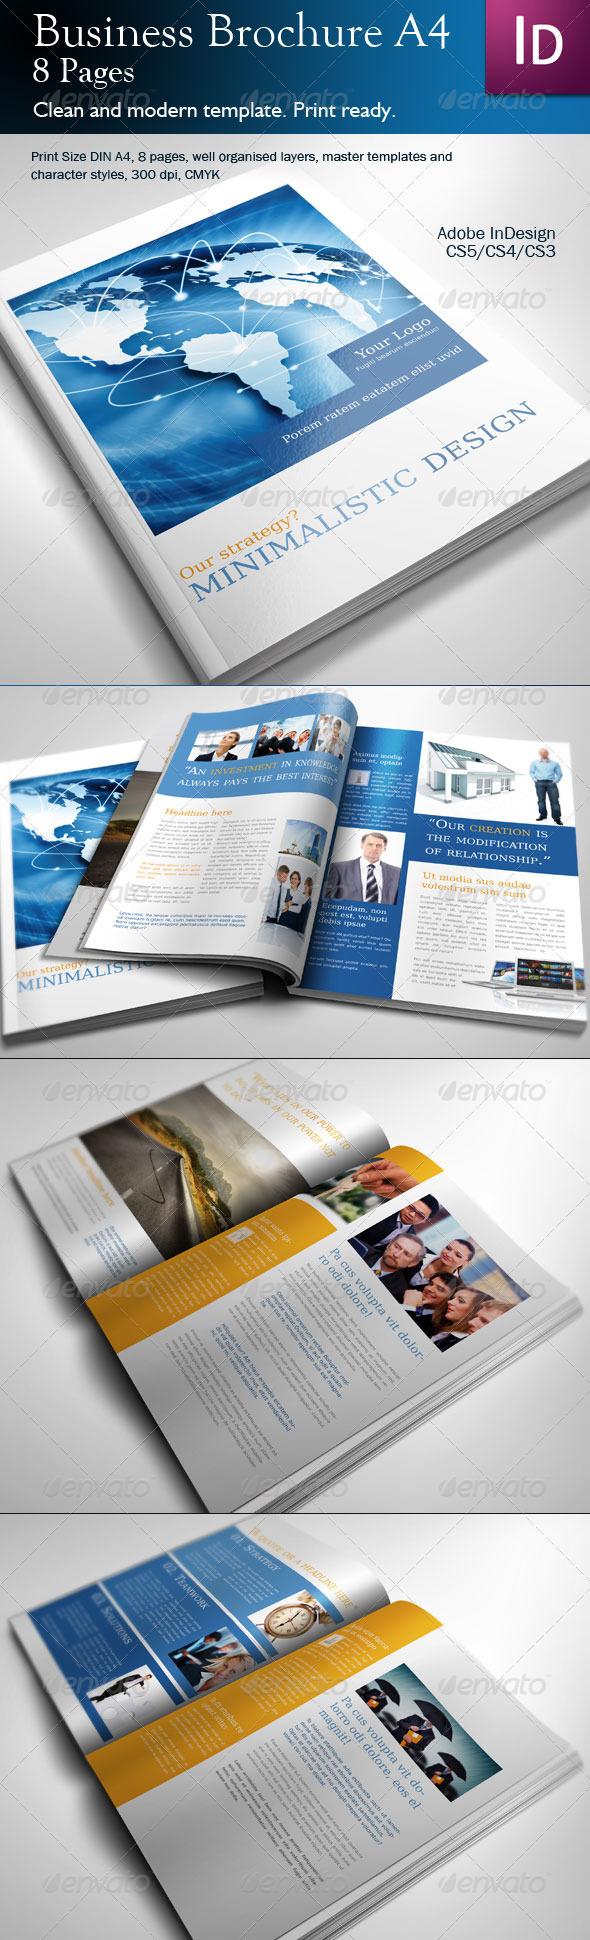 Business Brochure A4 - Corporate Brochures